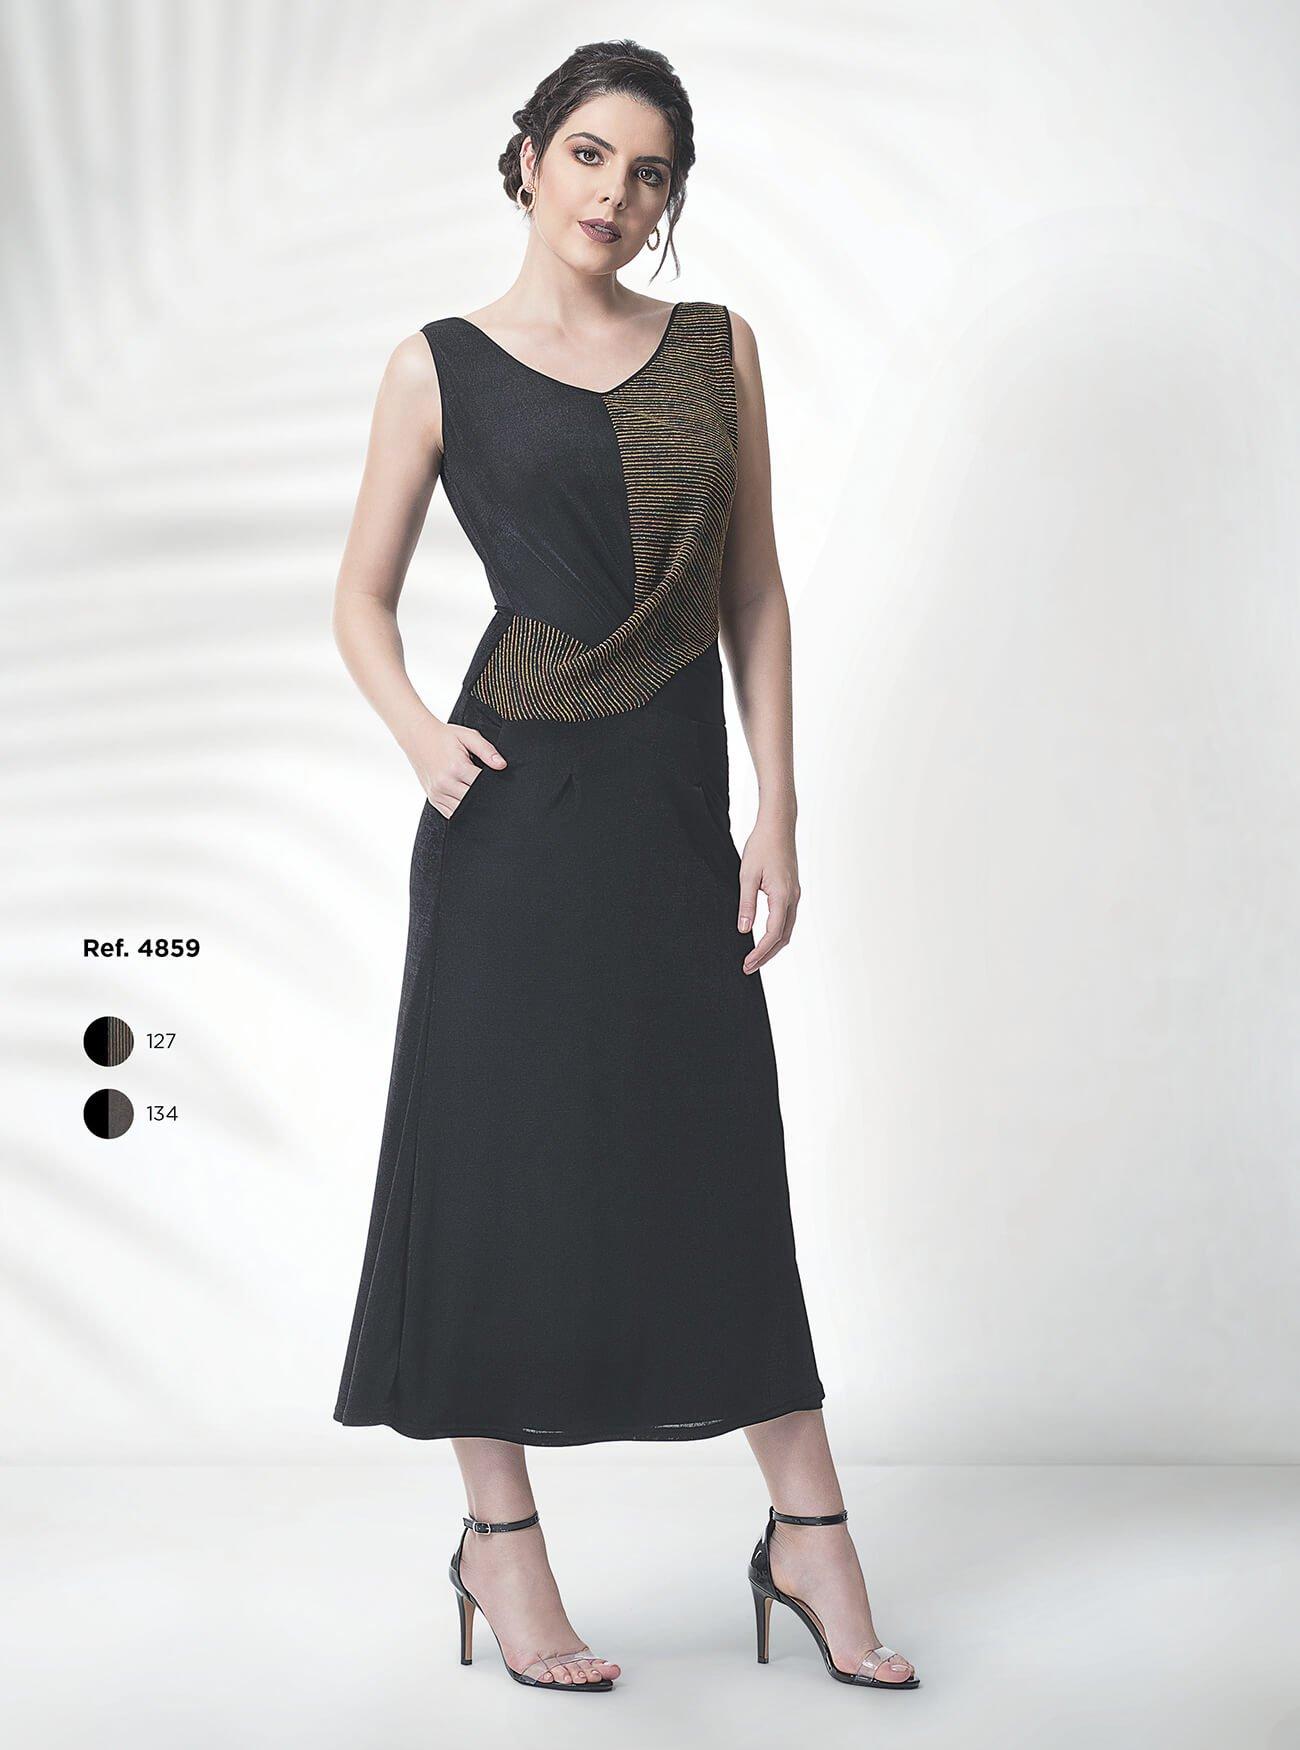 Vestido midi de malha com detalhe transpassado